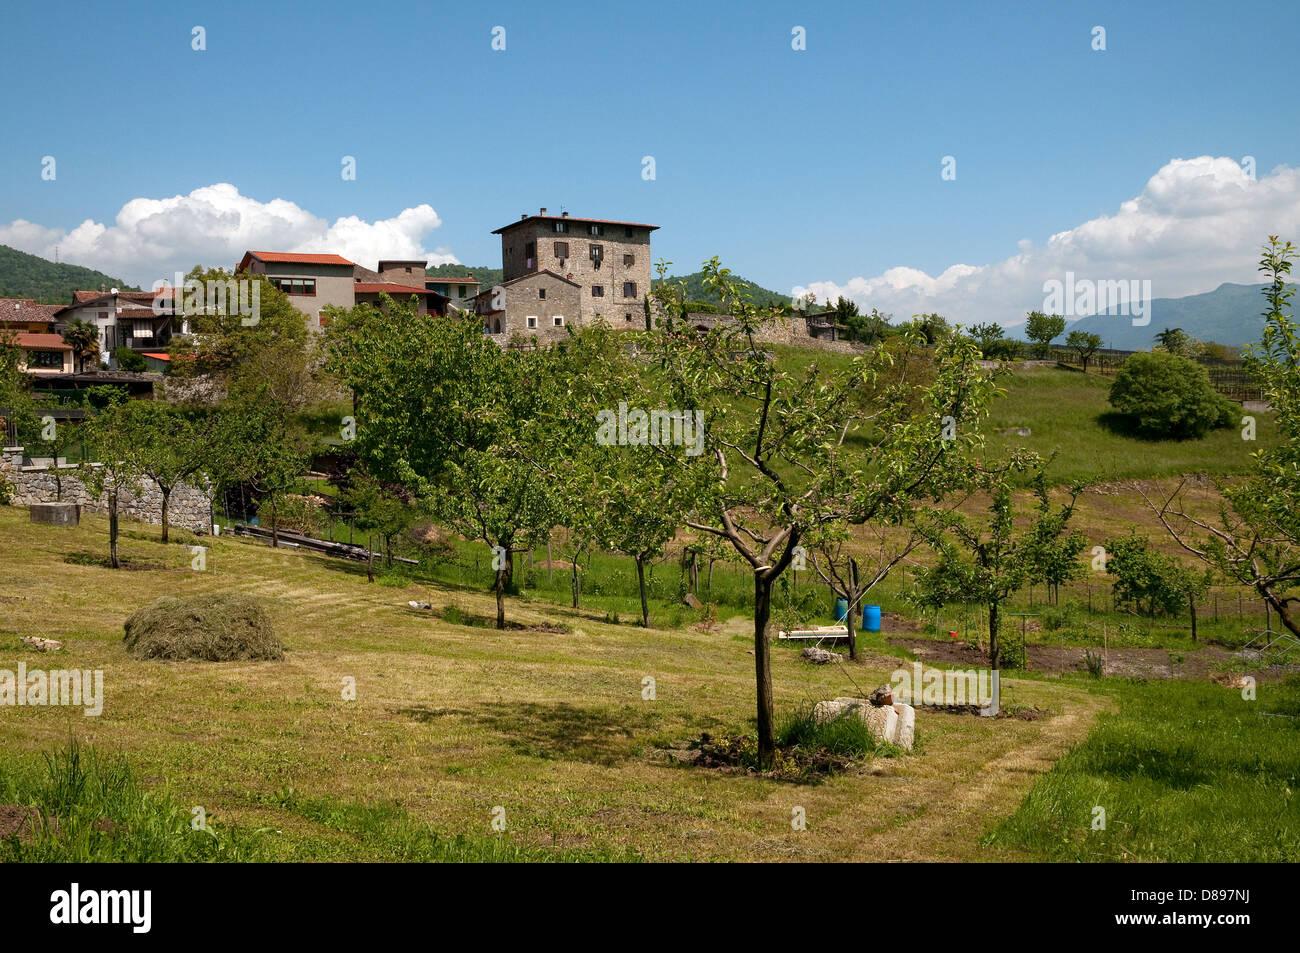 solto collina landscape, lake iseo, lombardy, italy - Stock Image